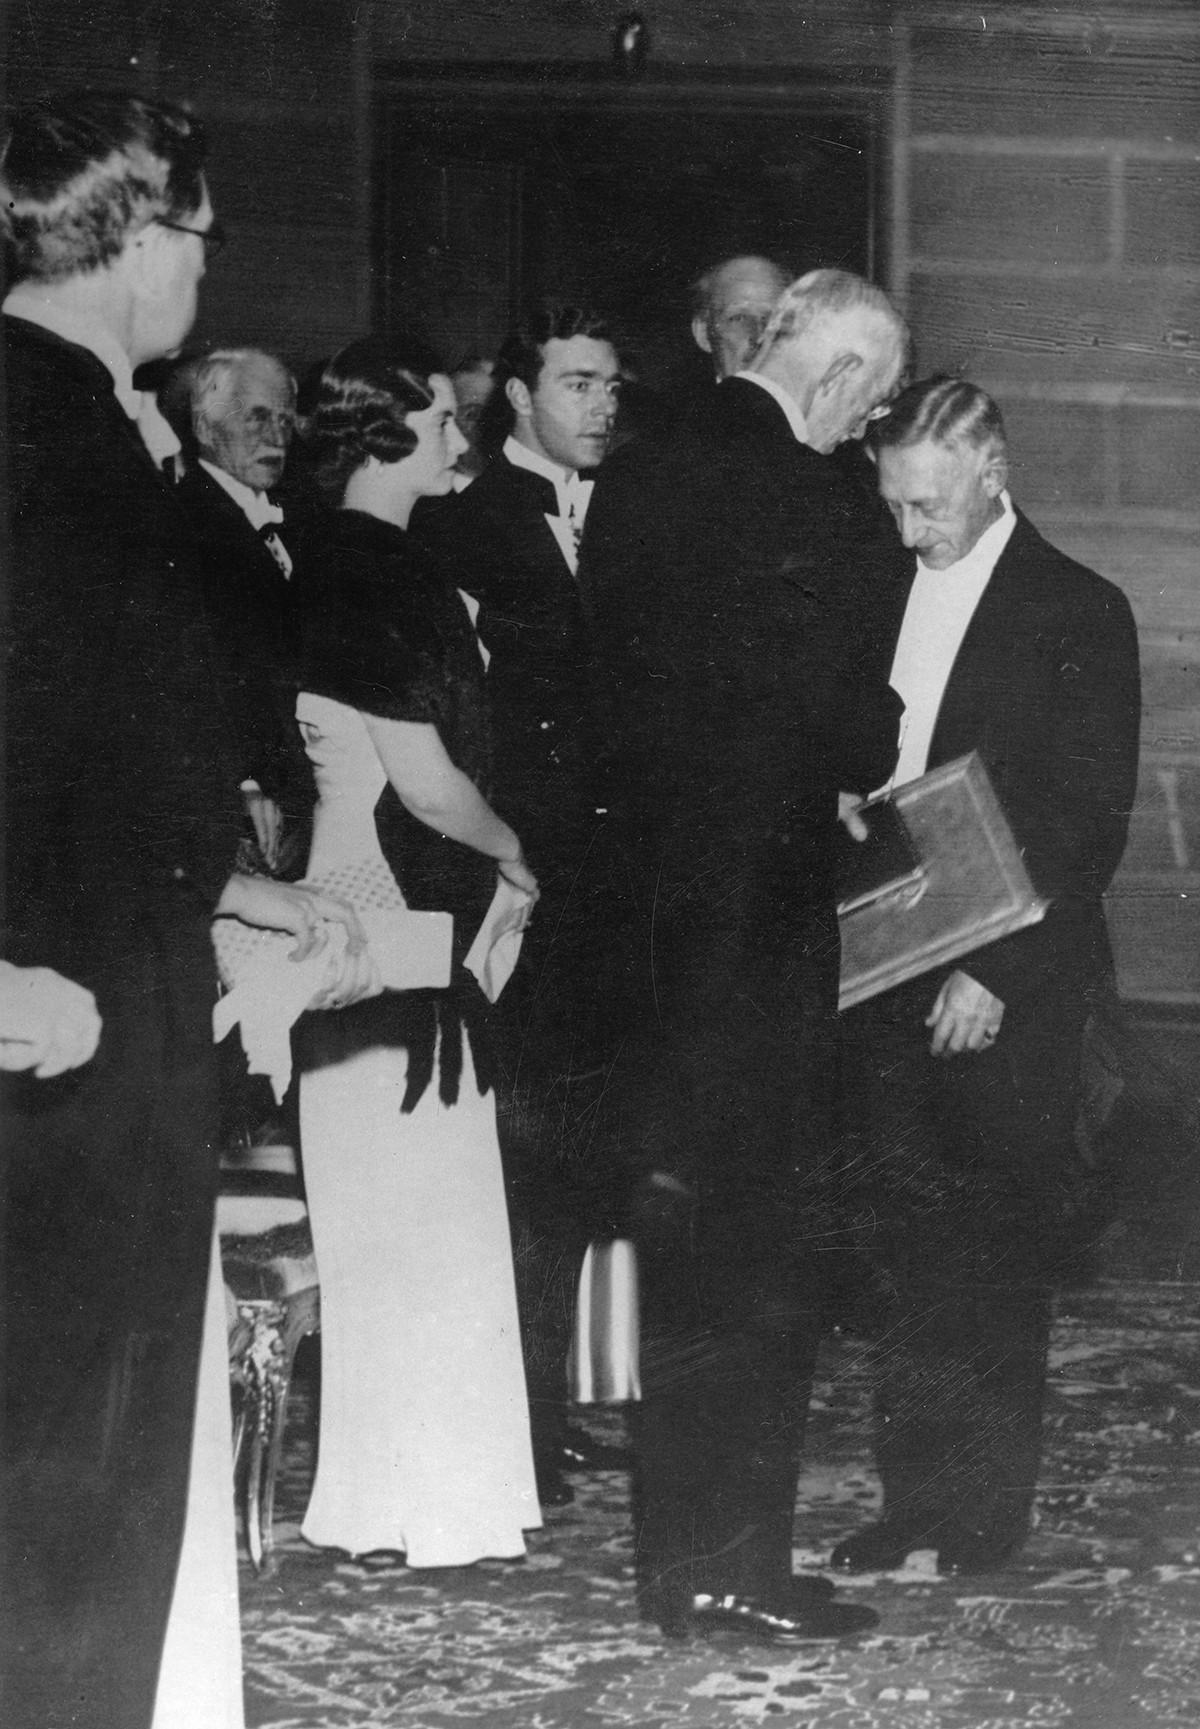 Ivan Bunin at the Nobel Prize awarding ceremony